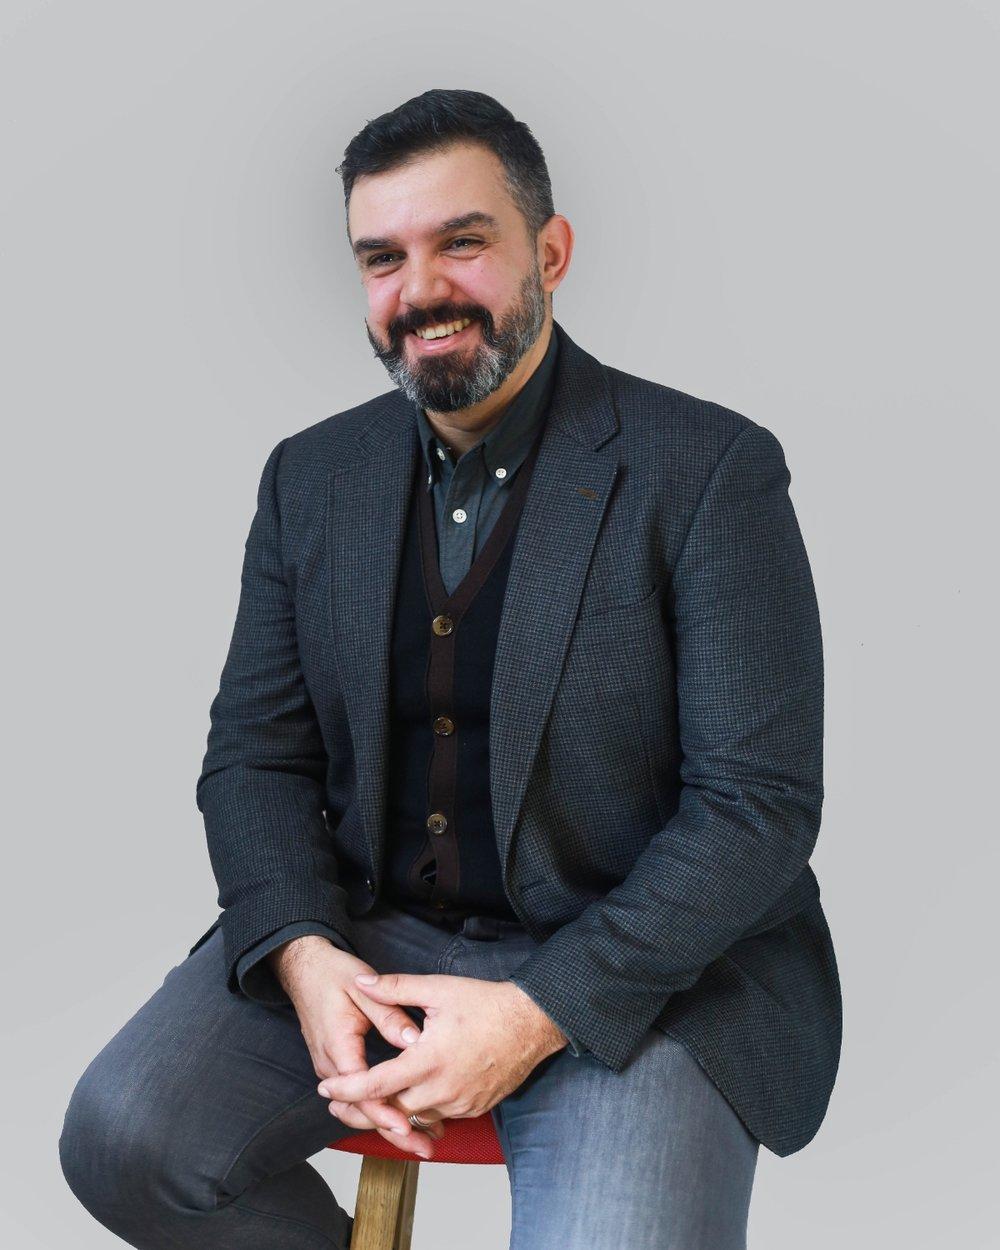 Joao Ornelas, Associate